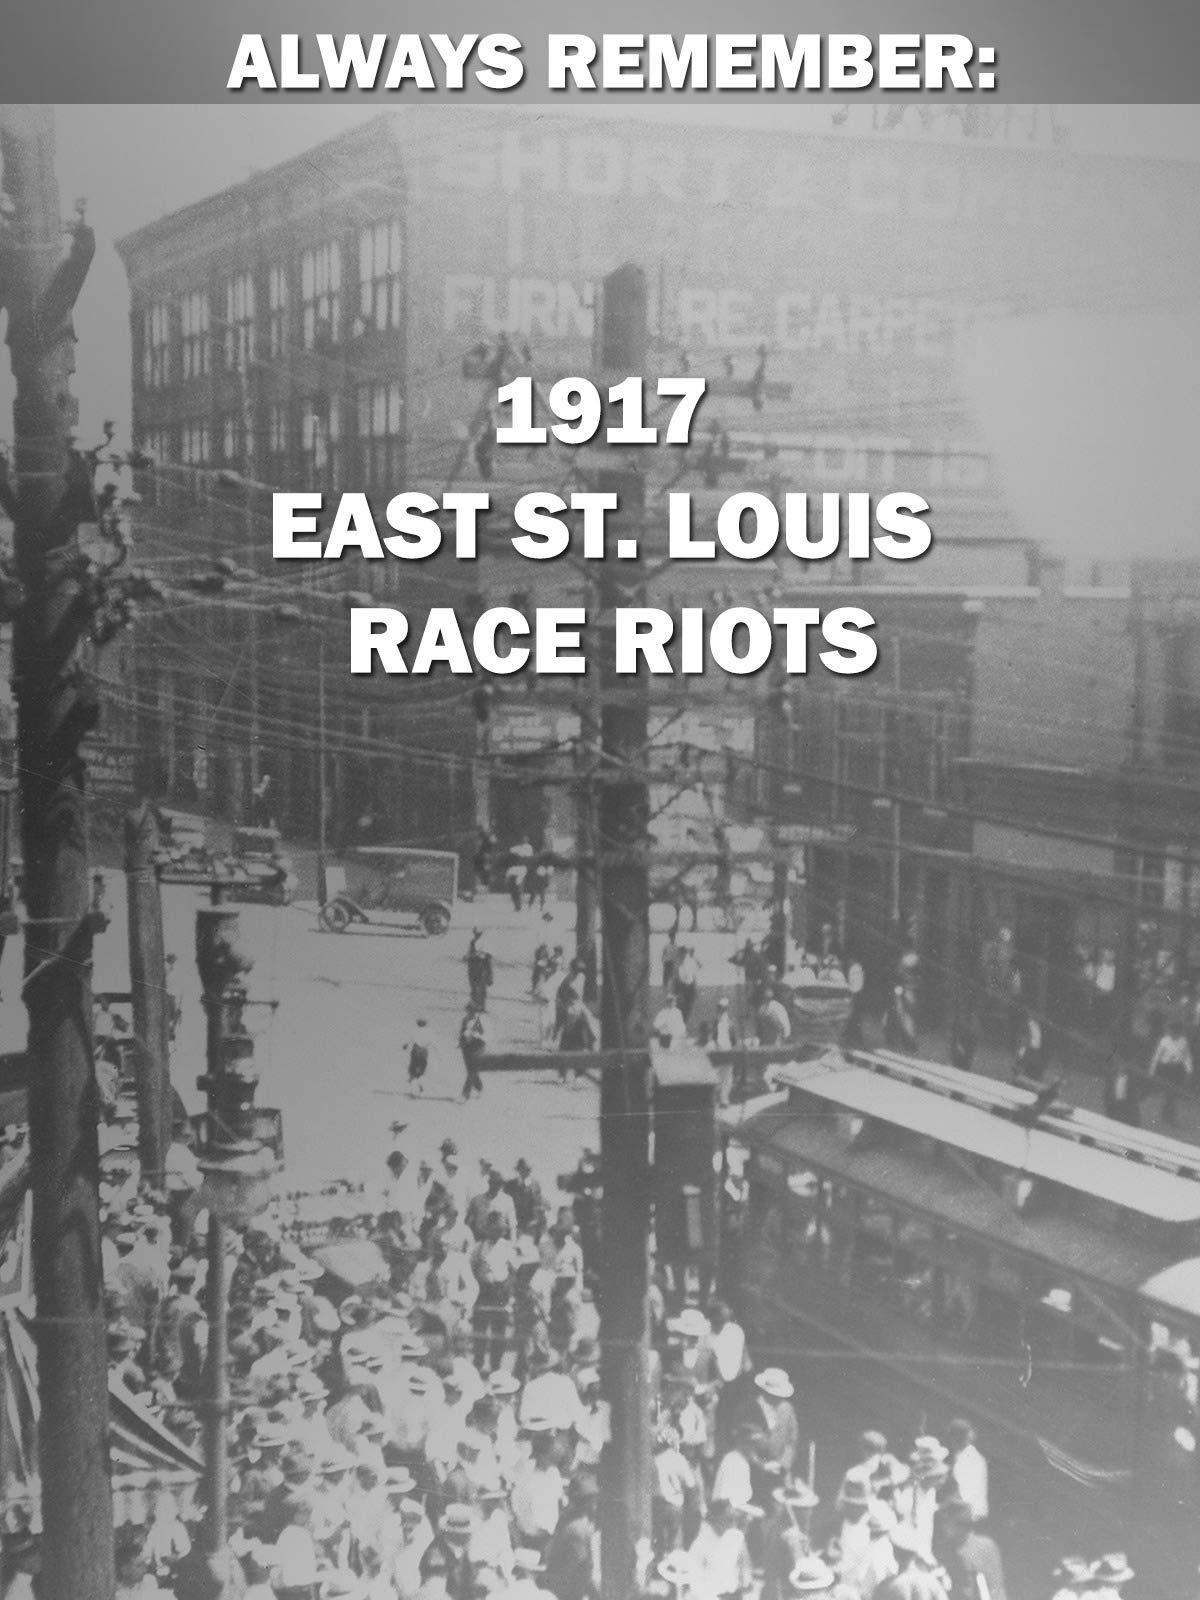 Always Remember: 1917 East St. Louis Race Riots